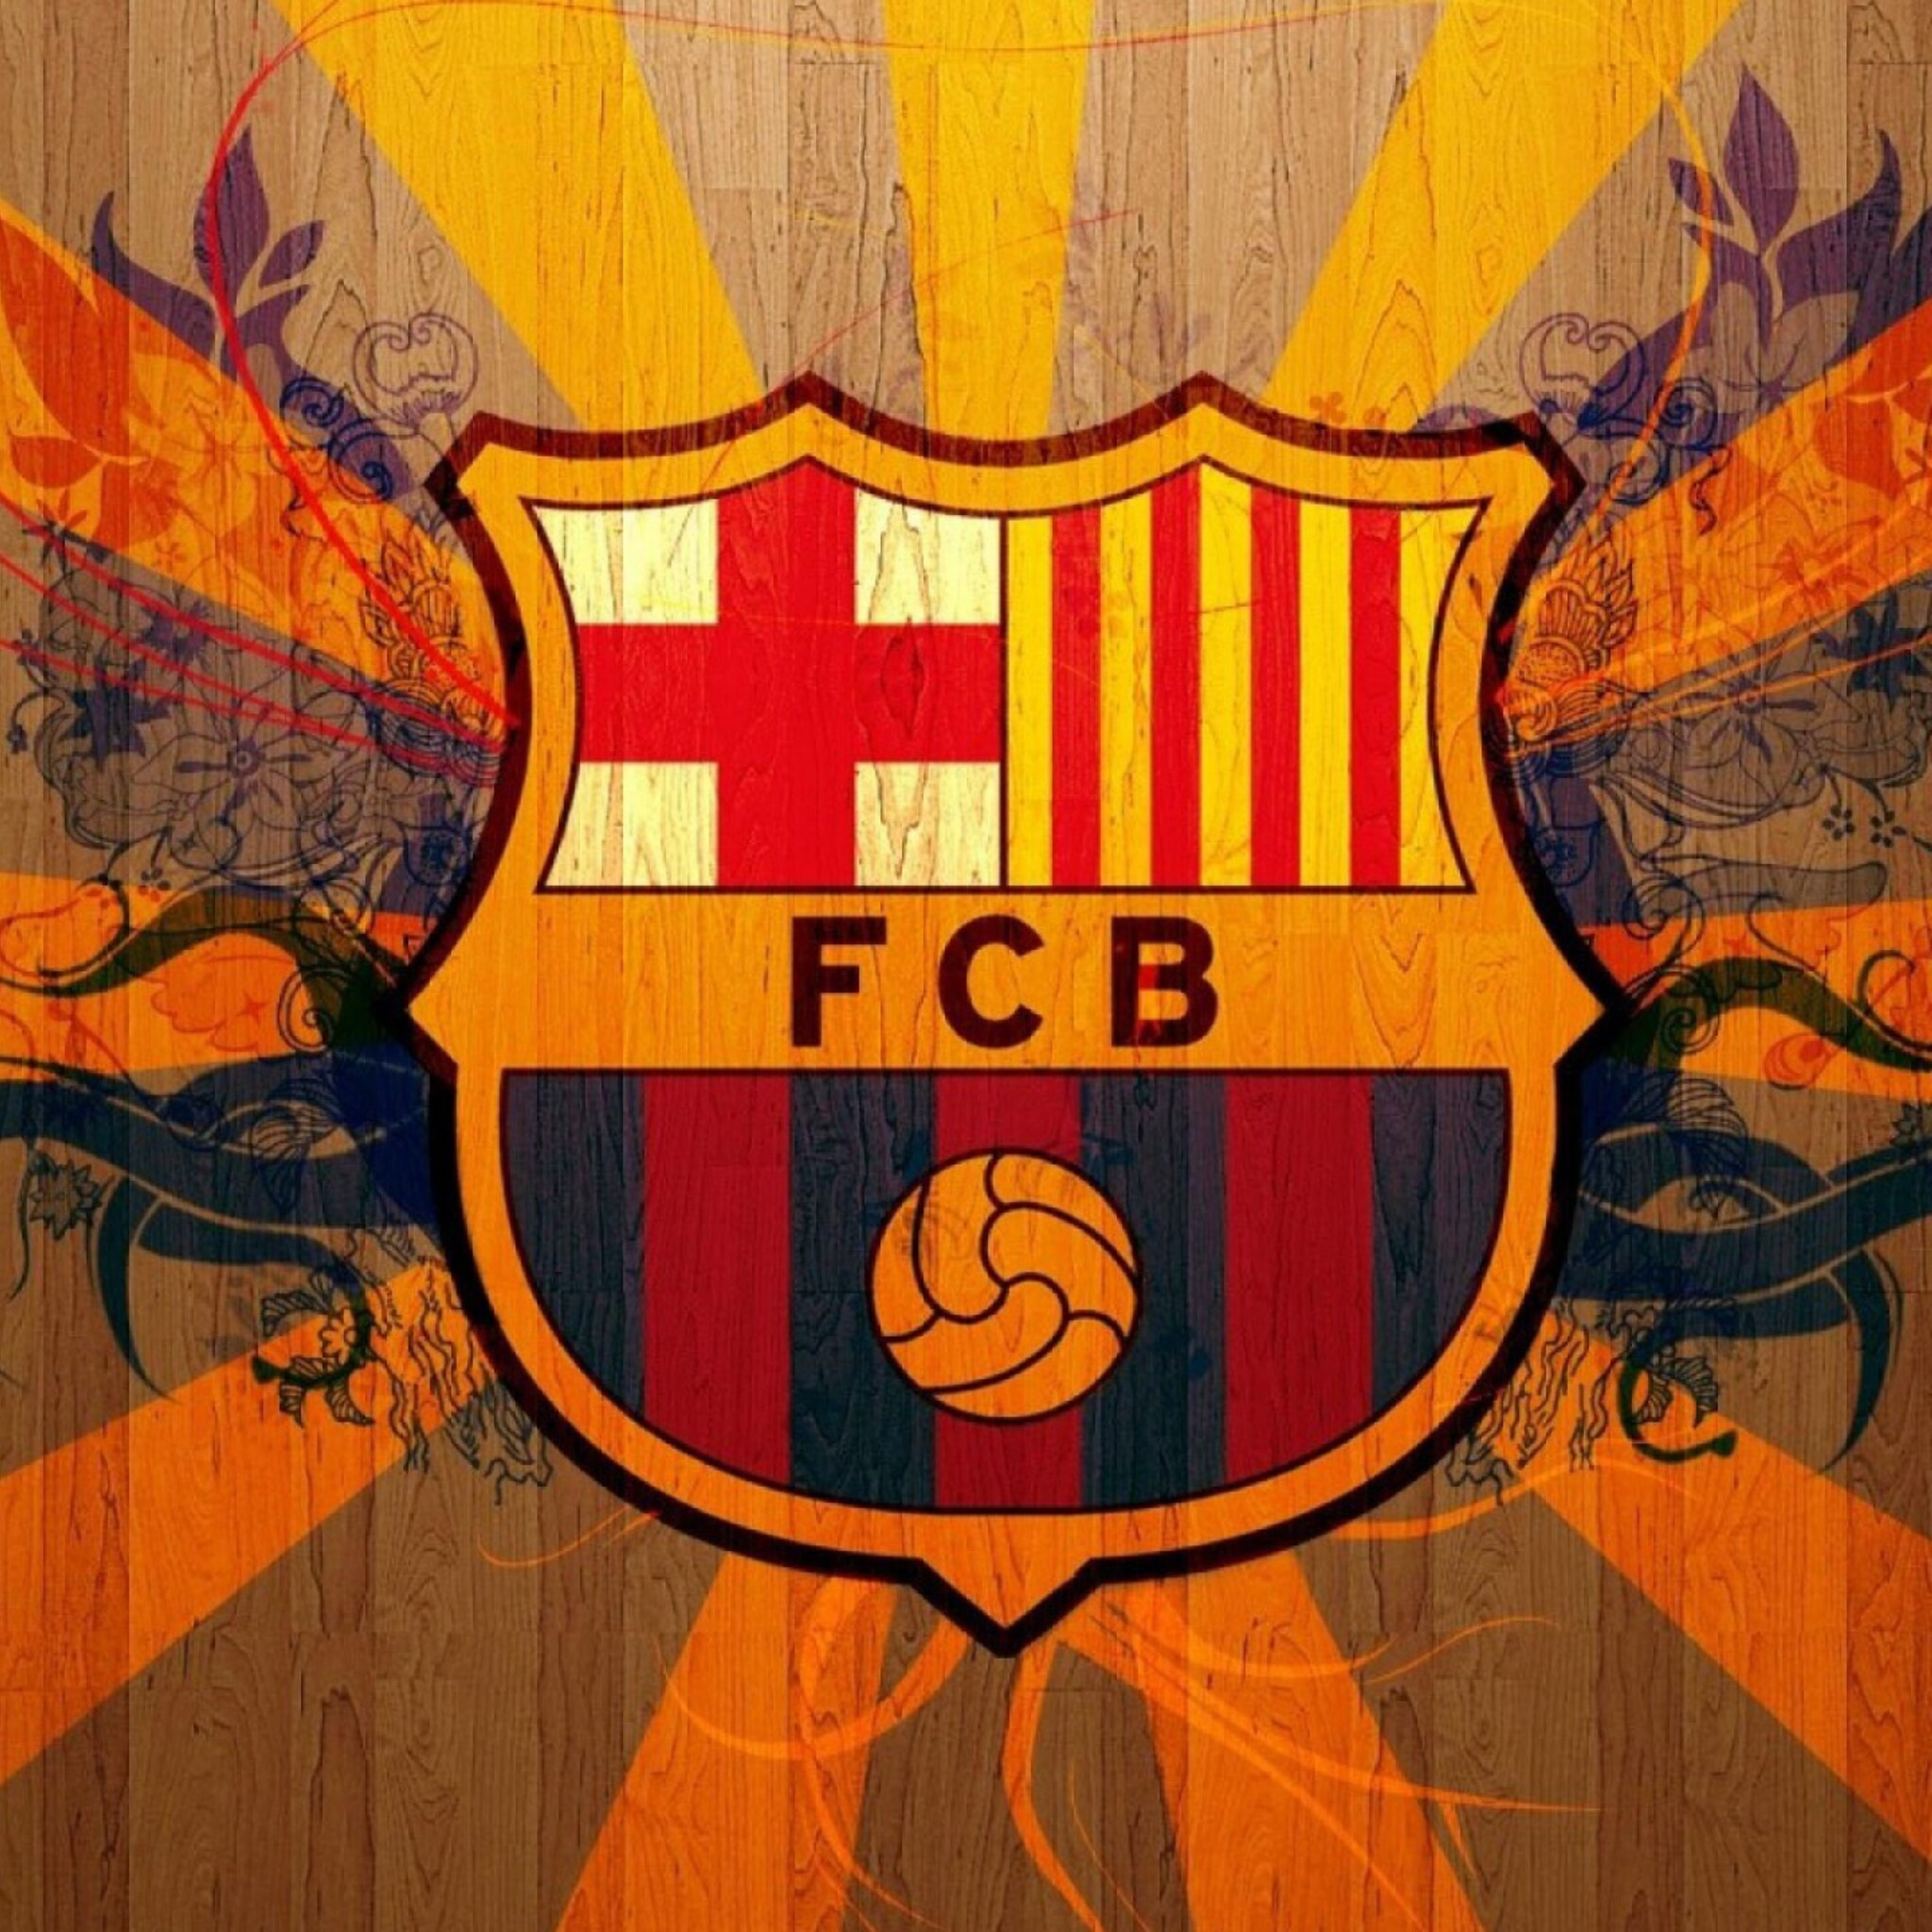 2048x2048 Fc Barcelona Logo Ipad Air Hd 4k Wallpapers Images